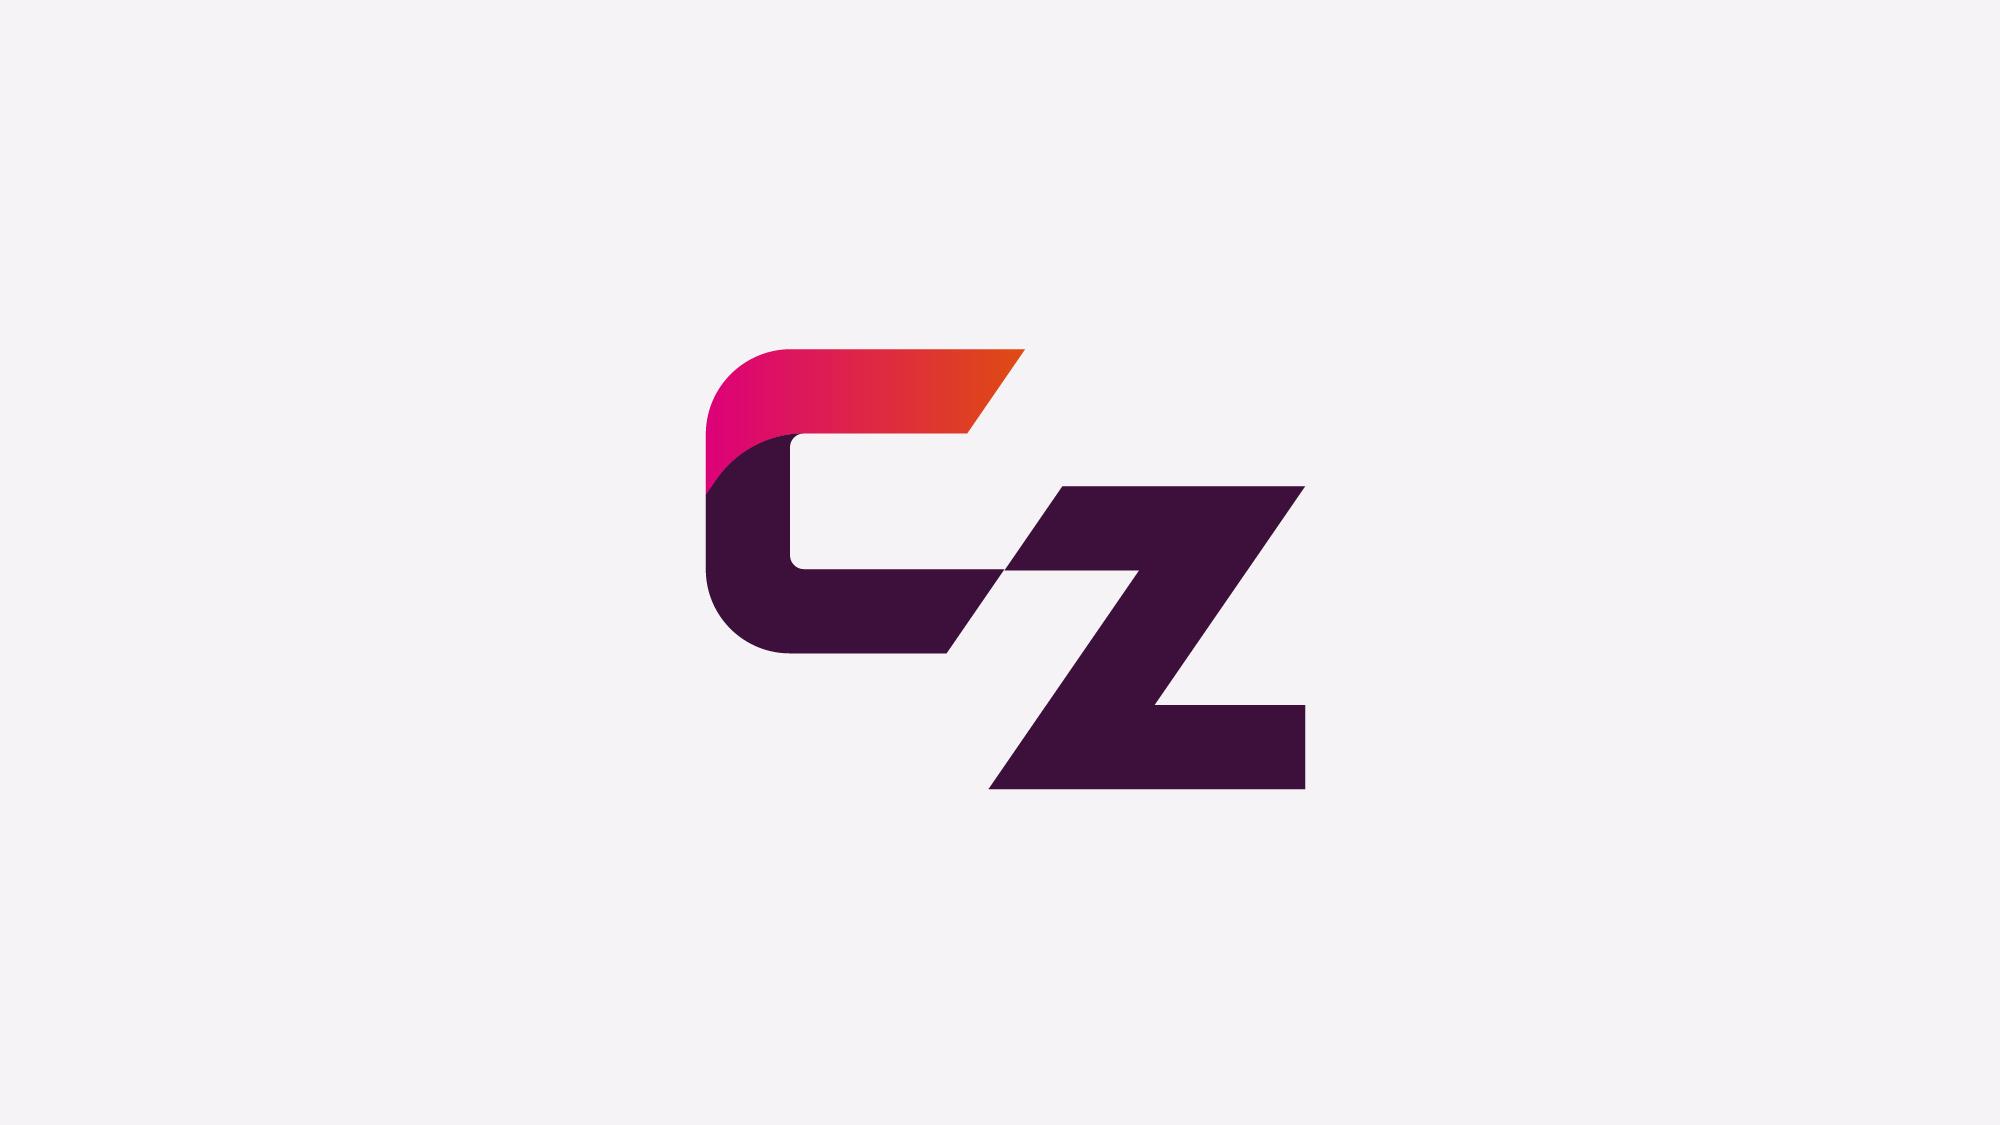 Lanatta-Branding-CZ-Consulting3